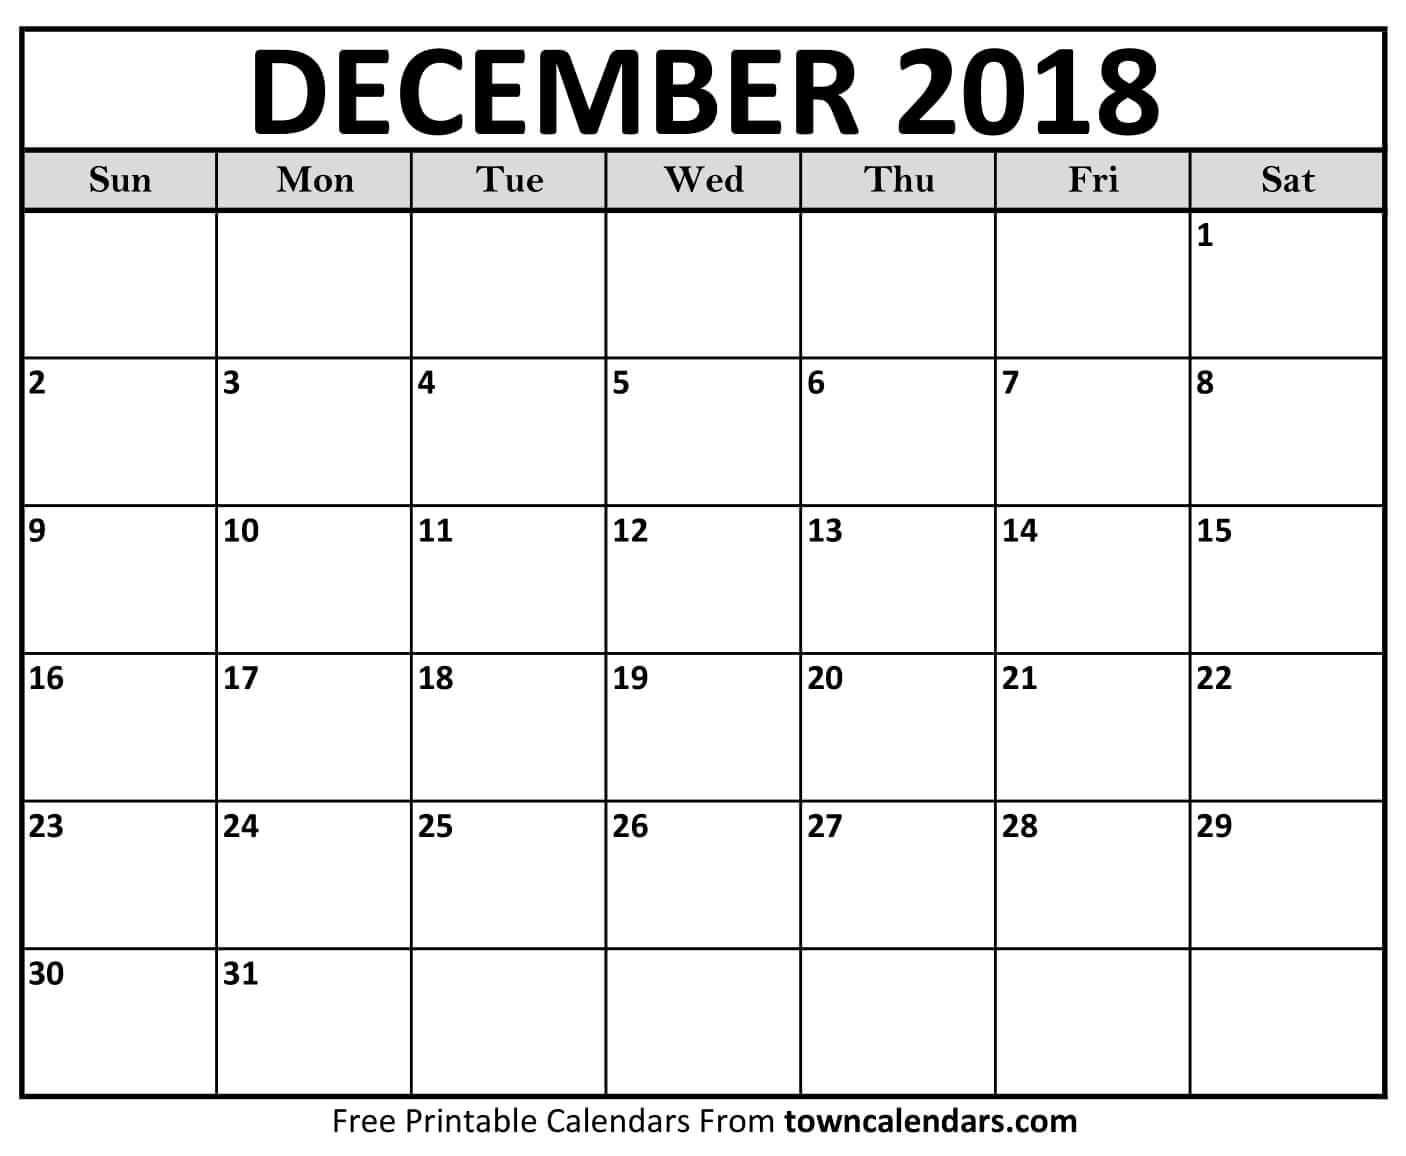 Monthly Calendar December 2018 Template Free Download within December Blank Monthly Calendar